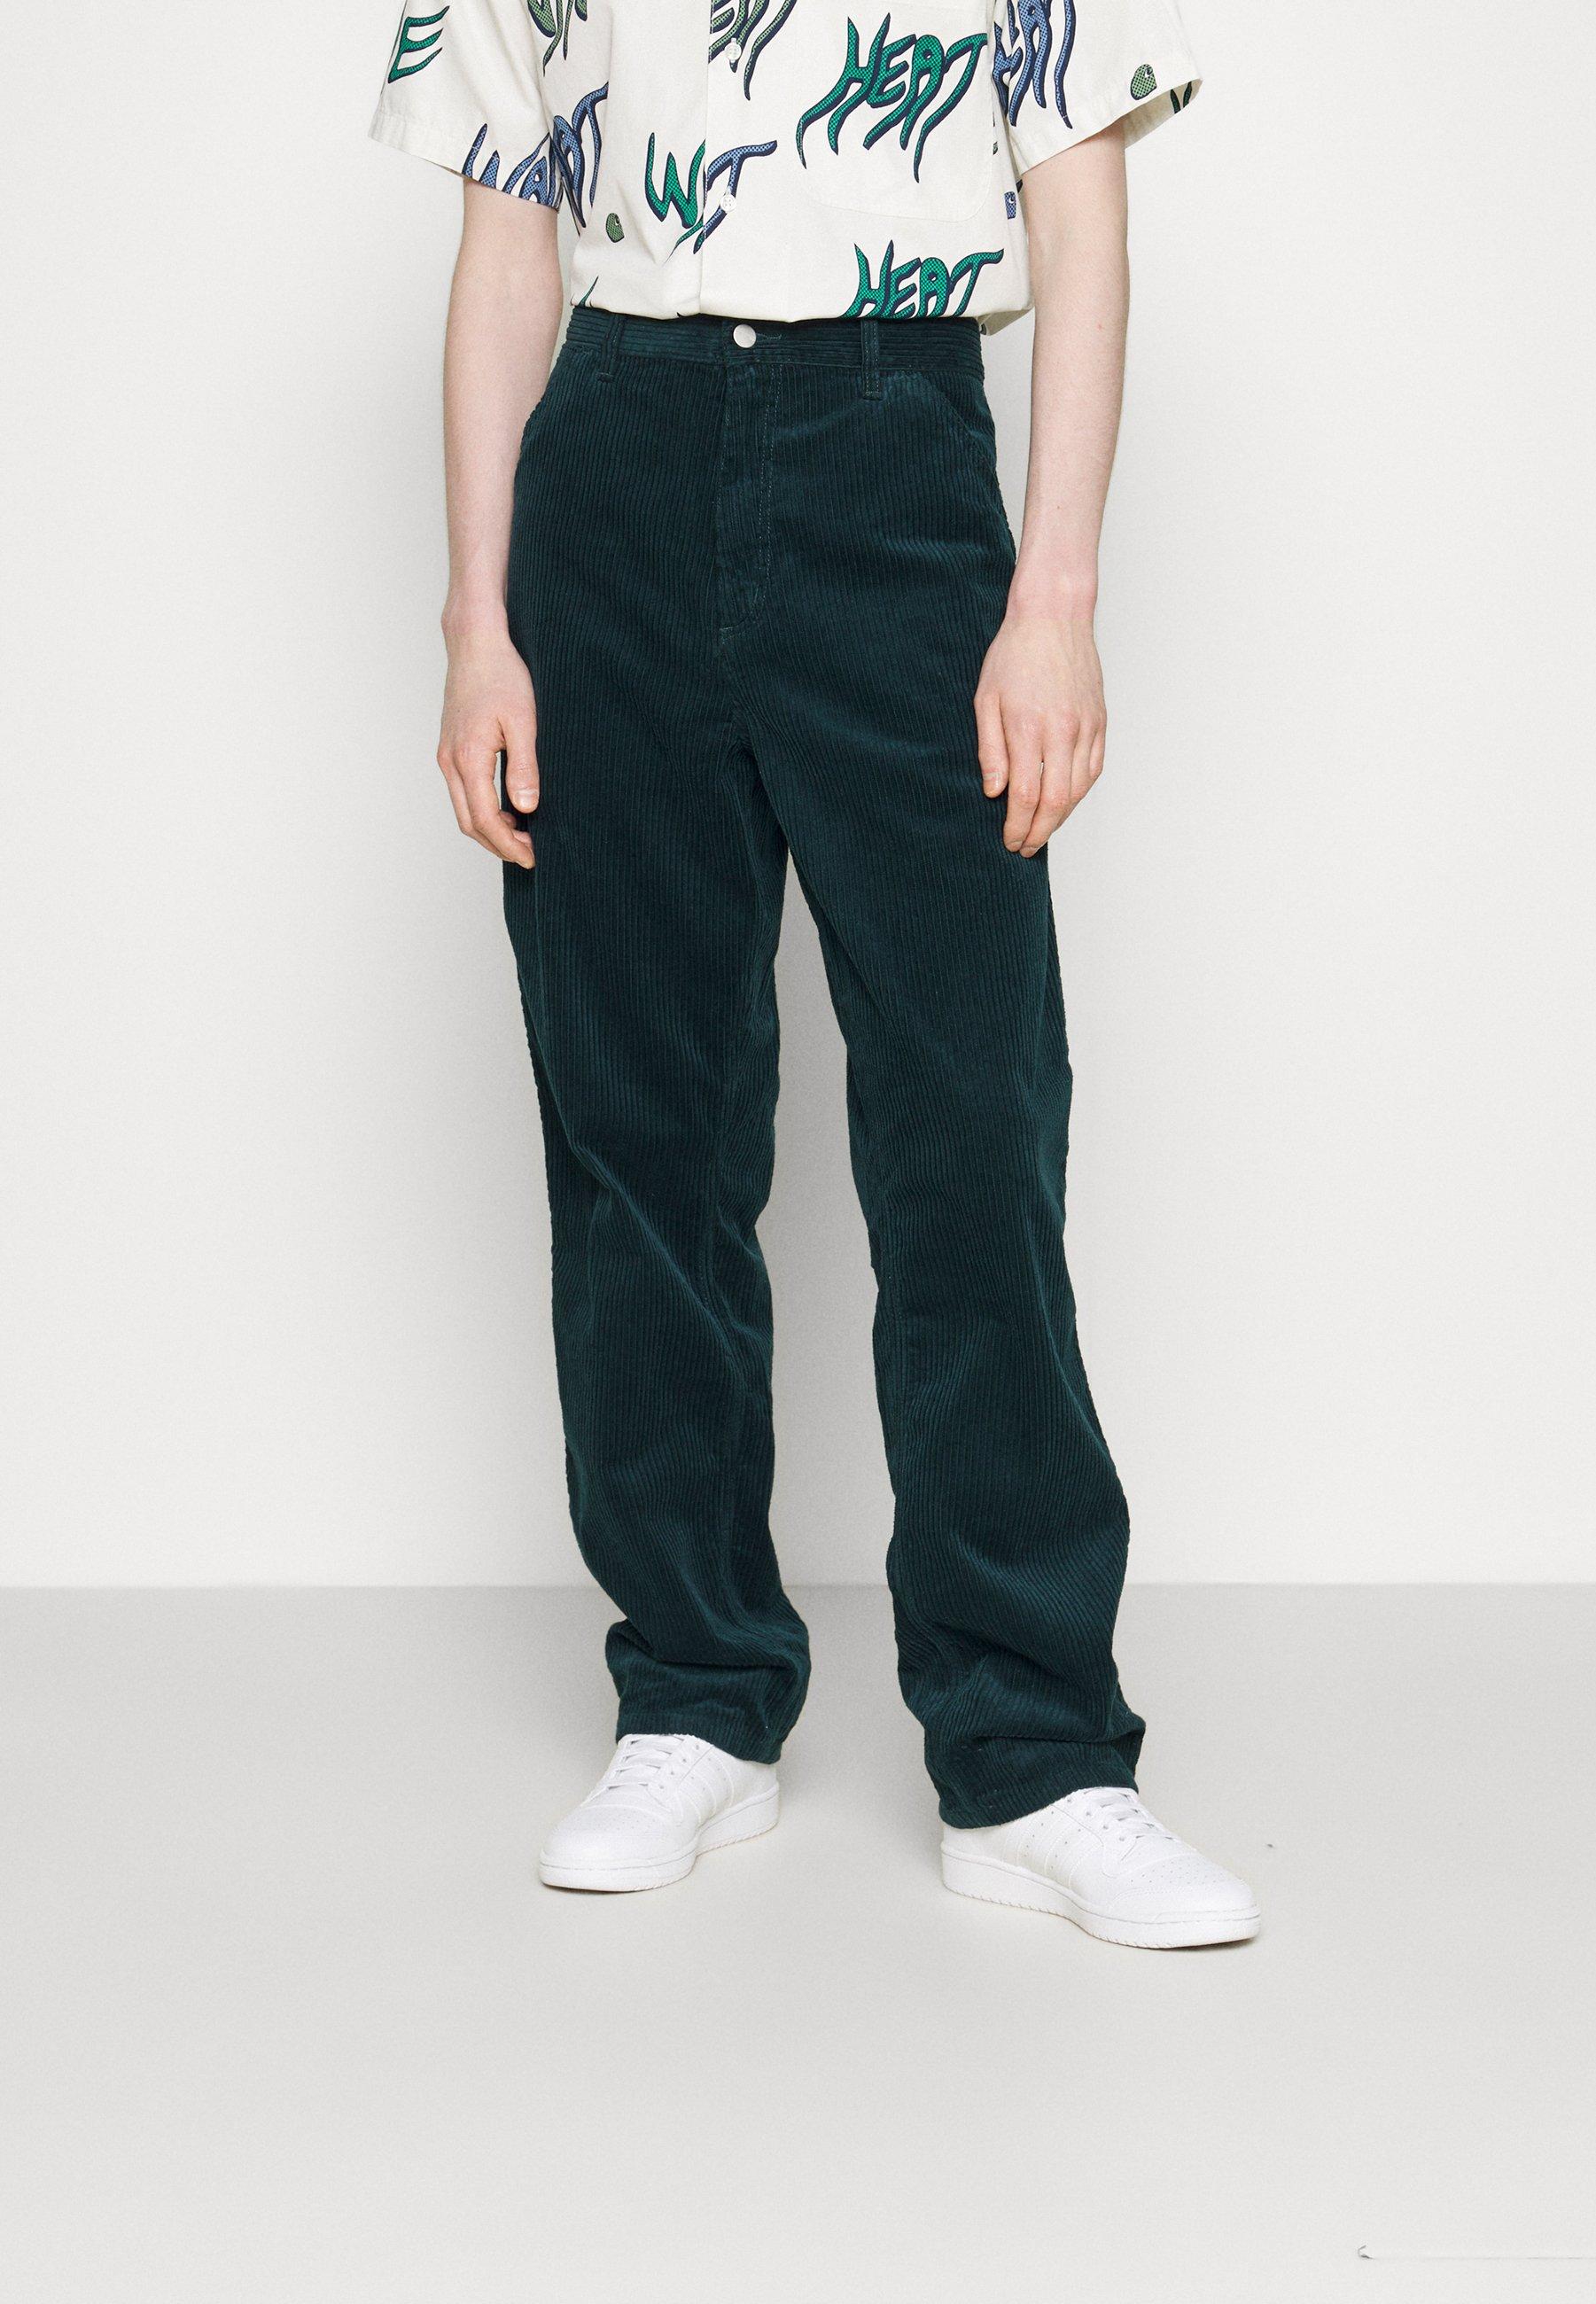 Homme SINGLE KNEE PANT URBANA - Pantalon classique